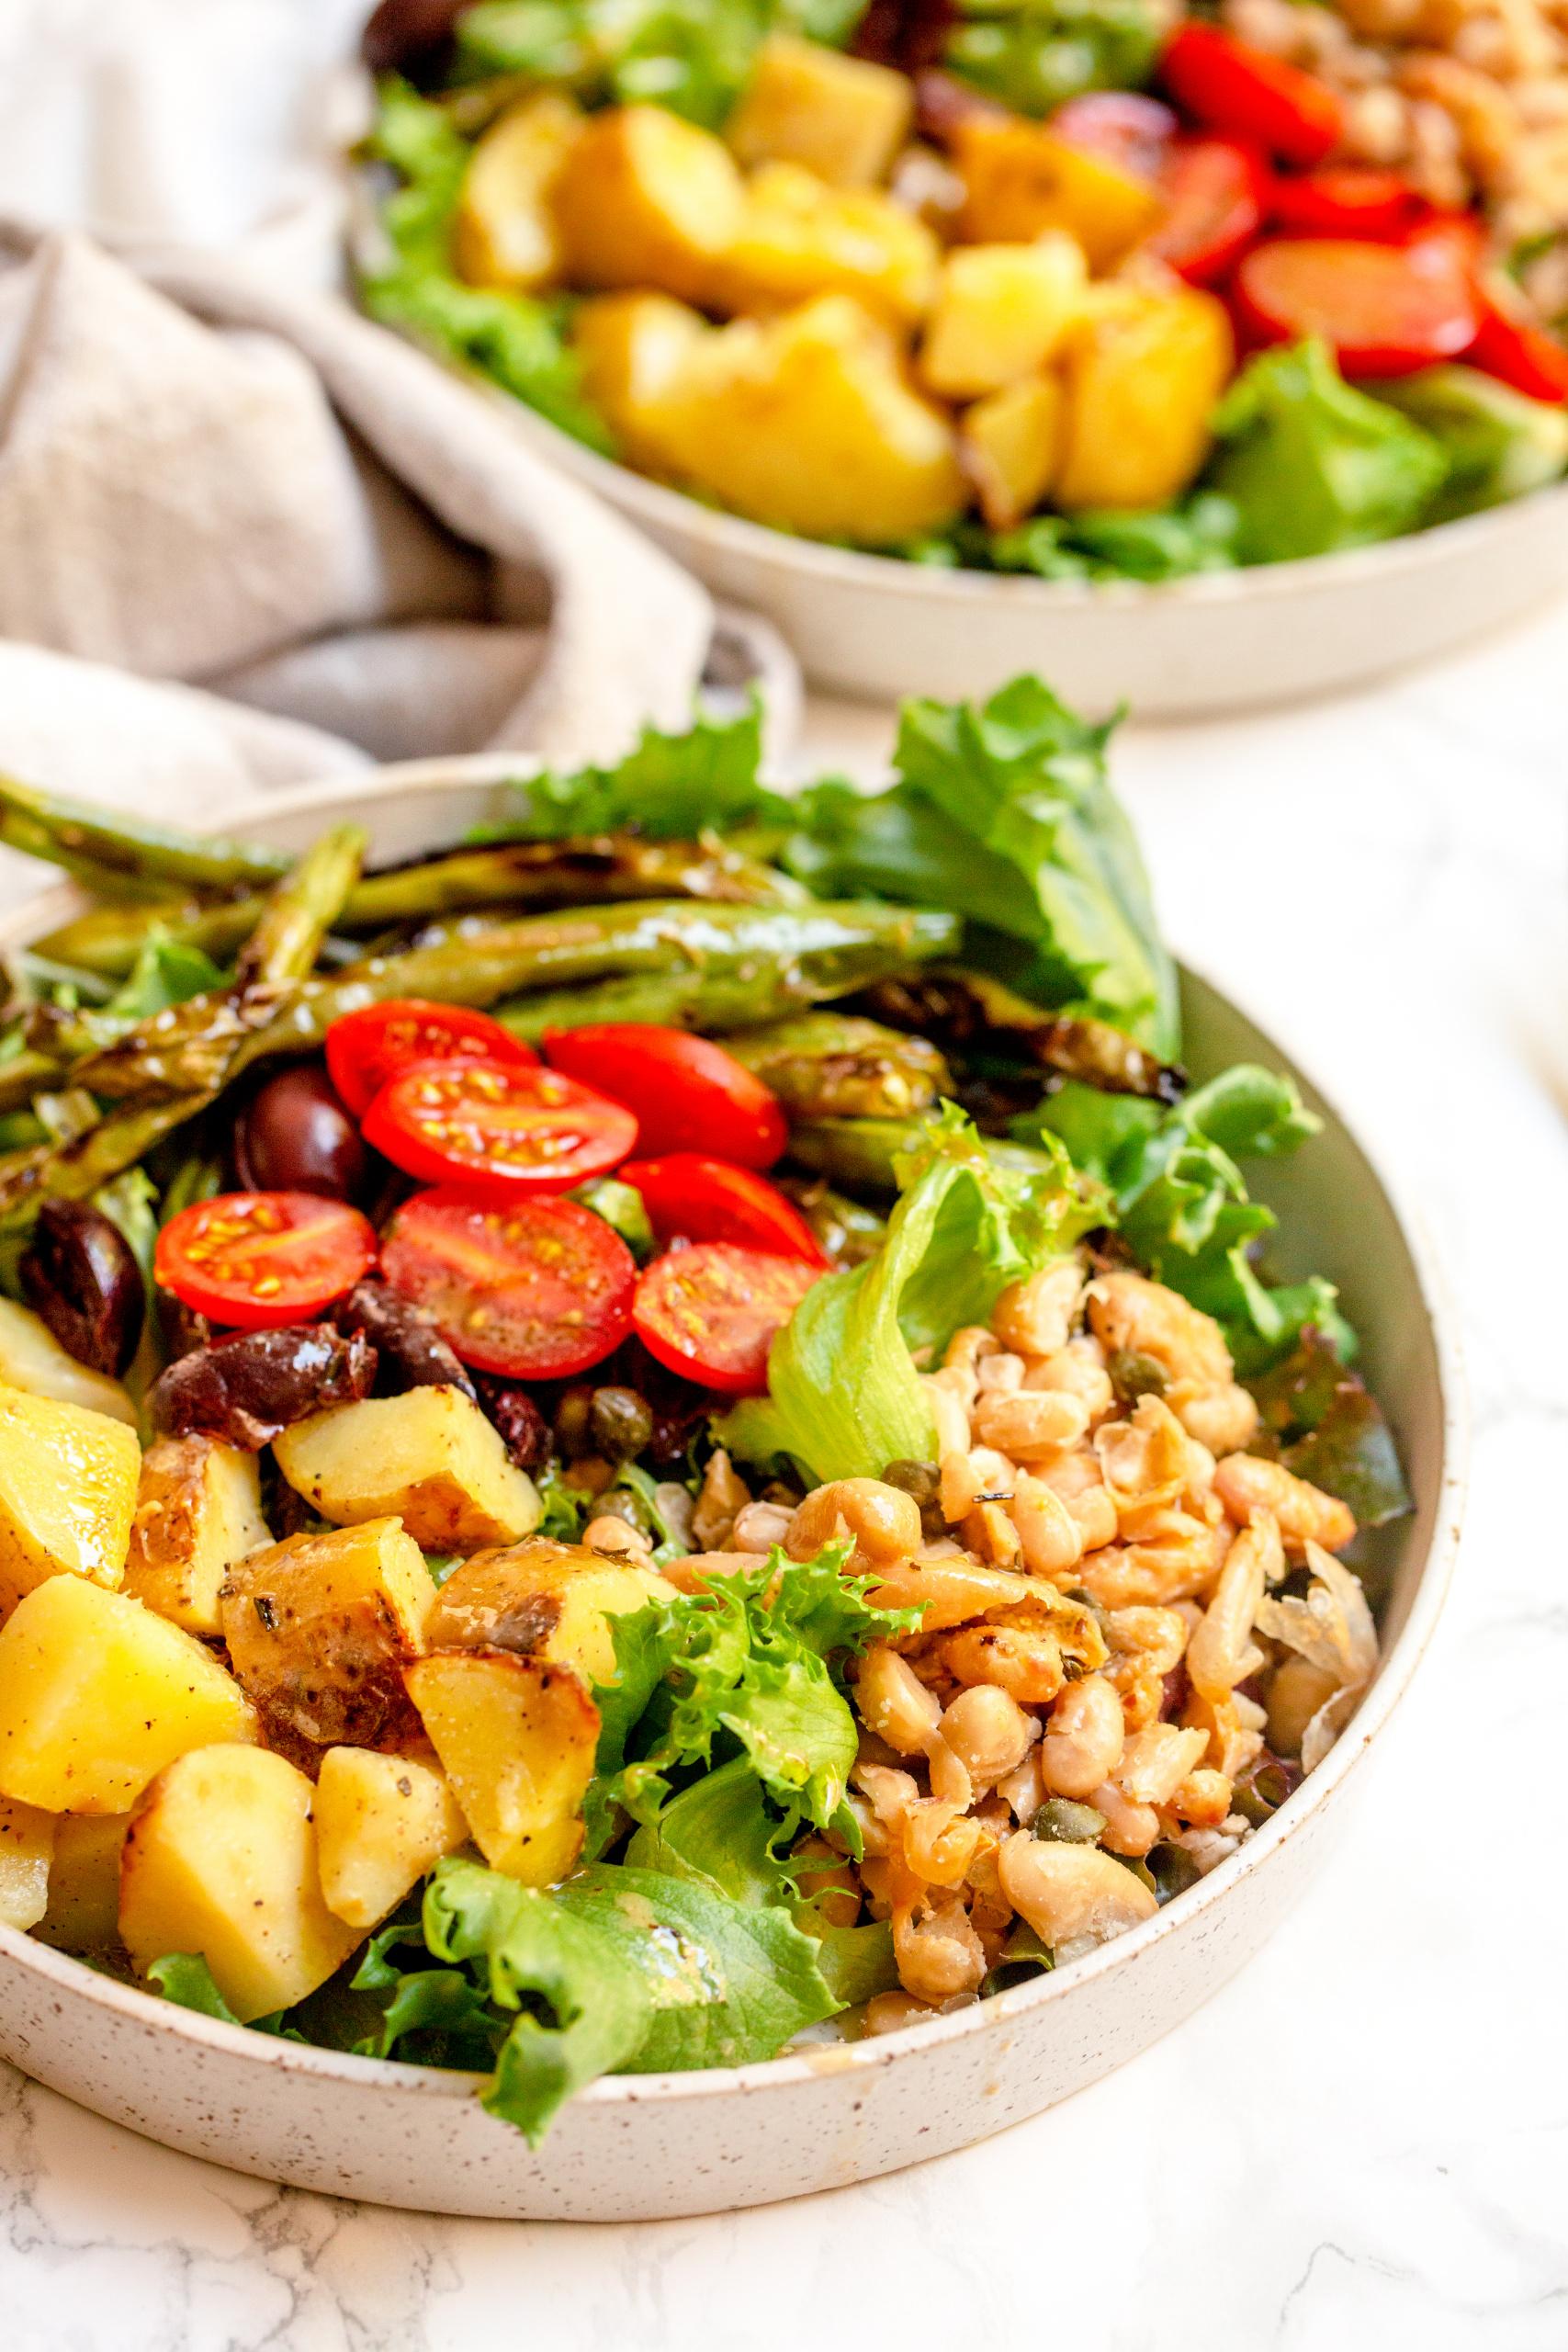 Vegan White Bean Nicoise Salad